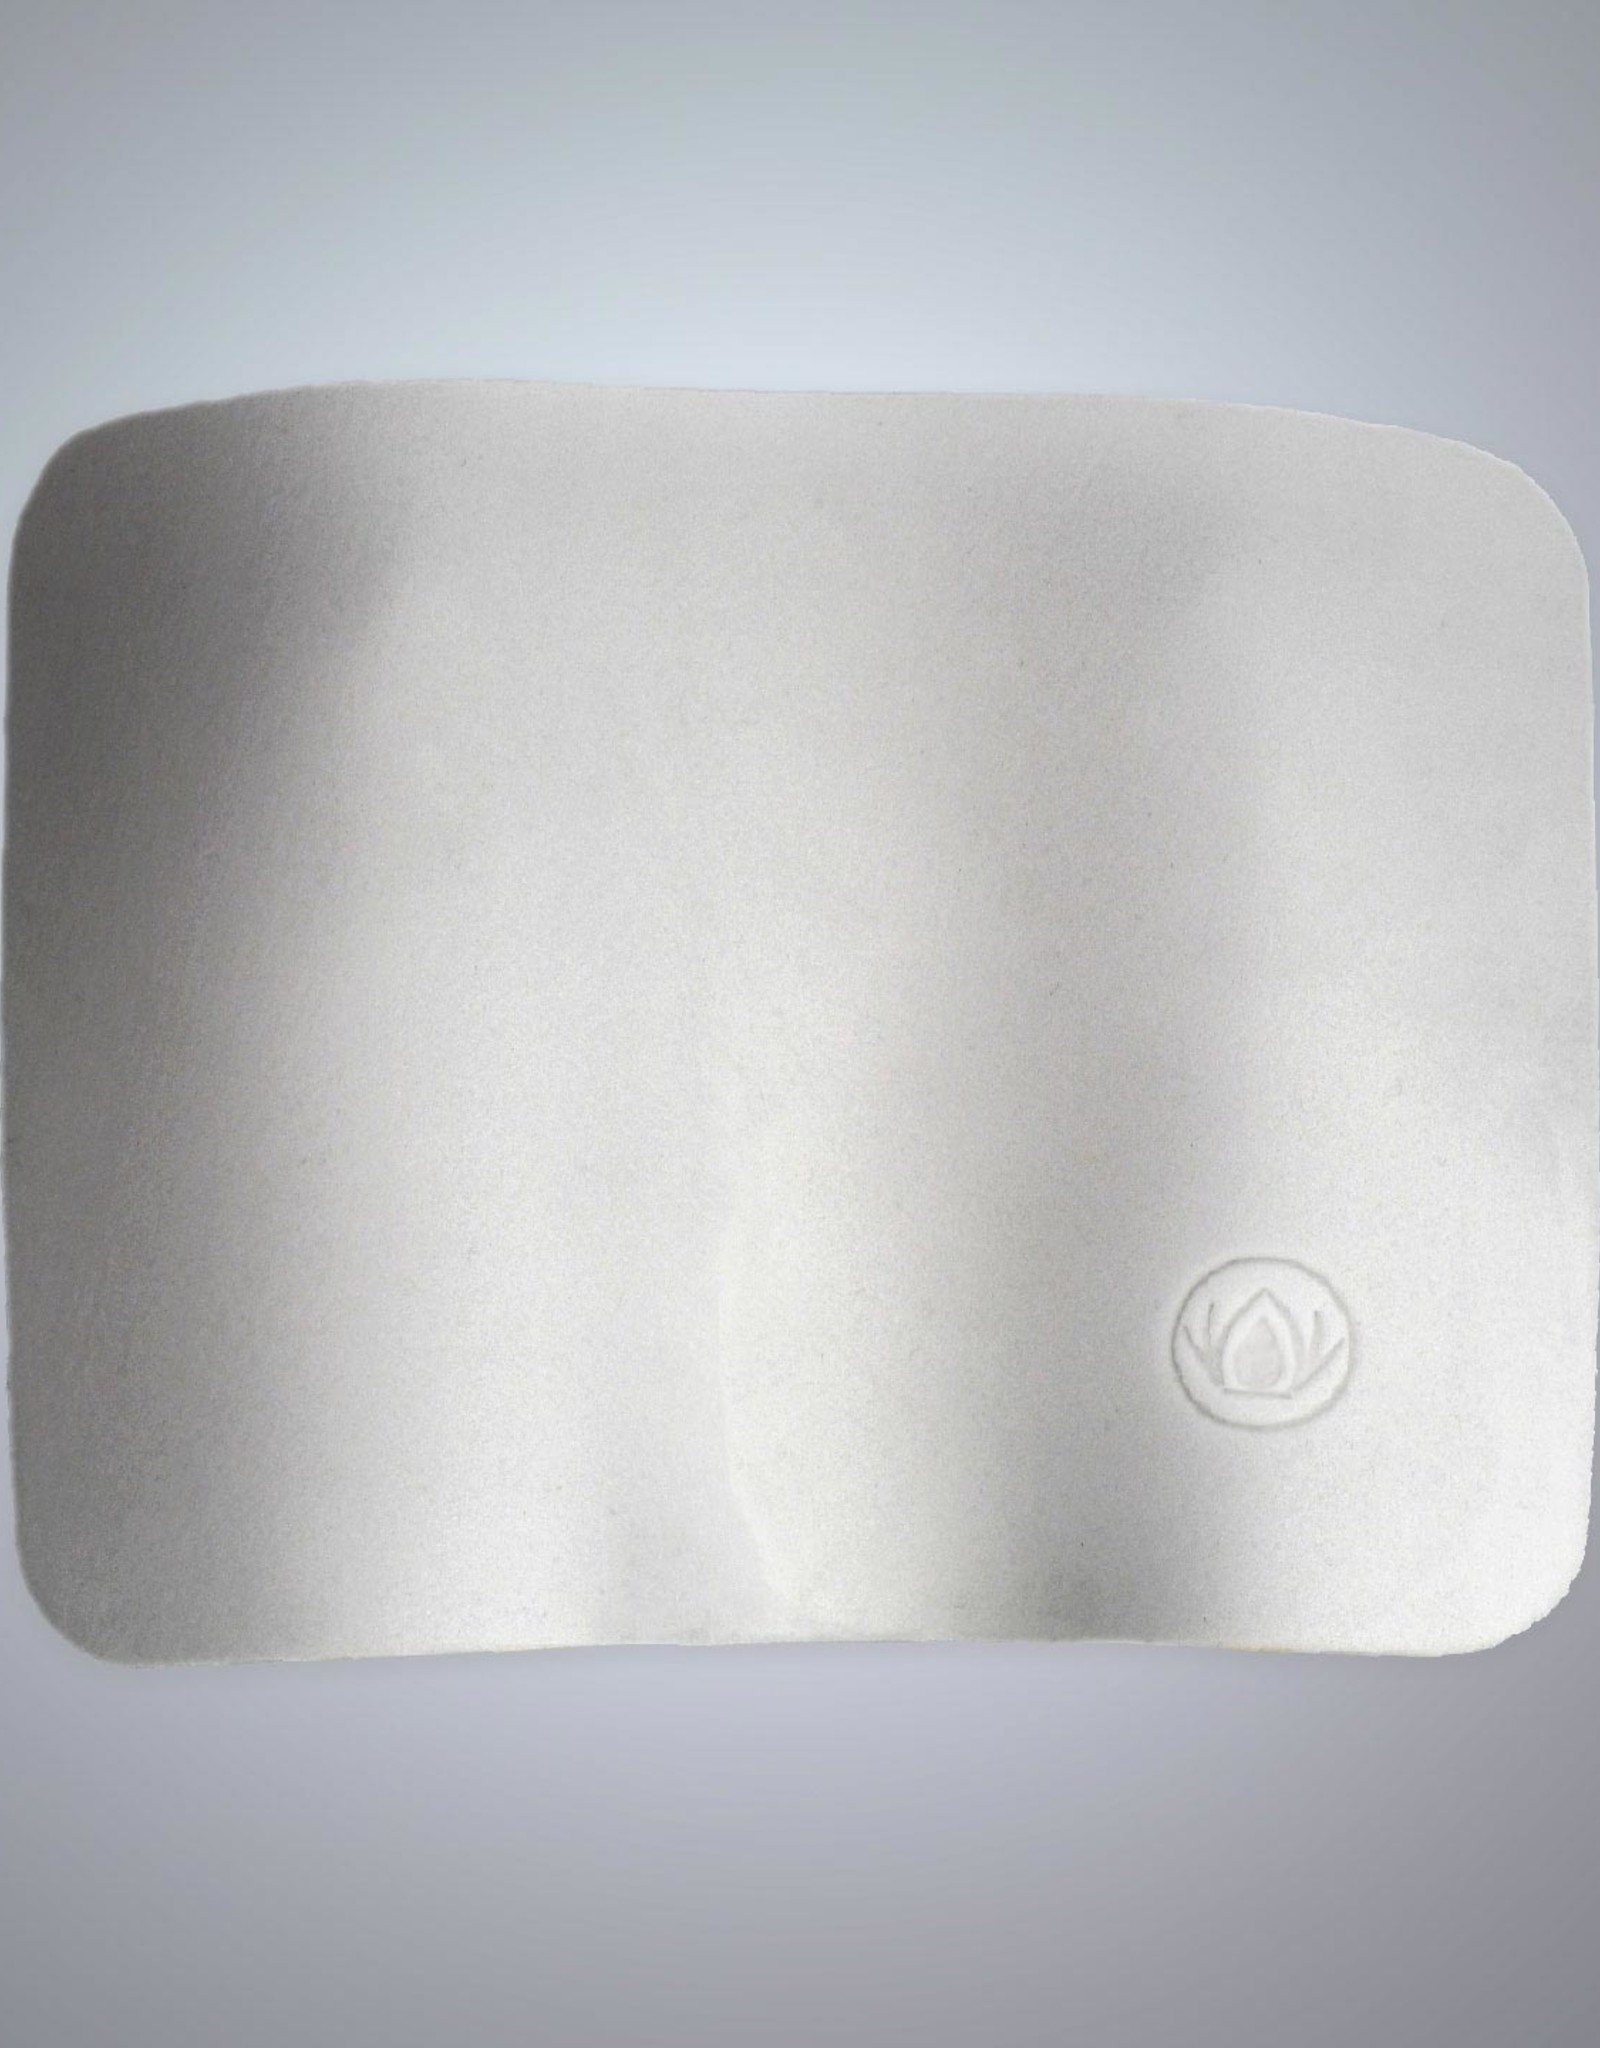 Redgrass Games RGG: Studio XL Hydration Foam Pad